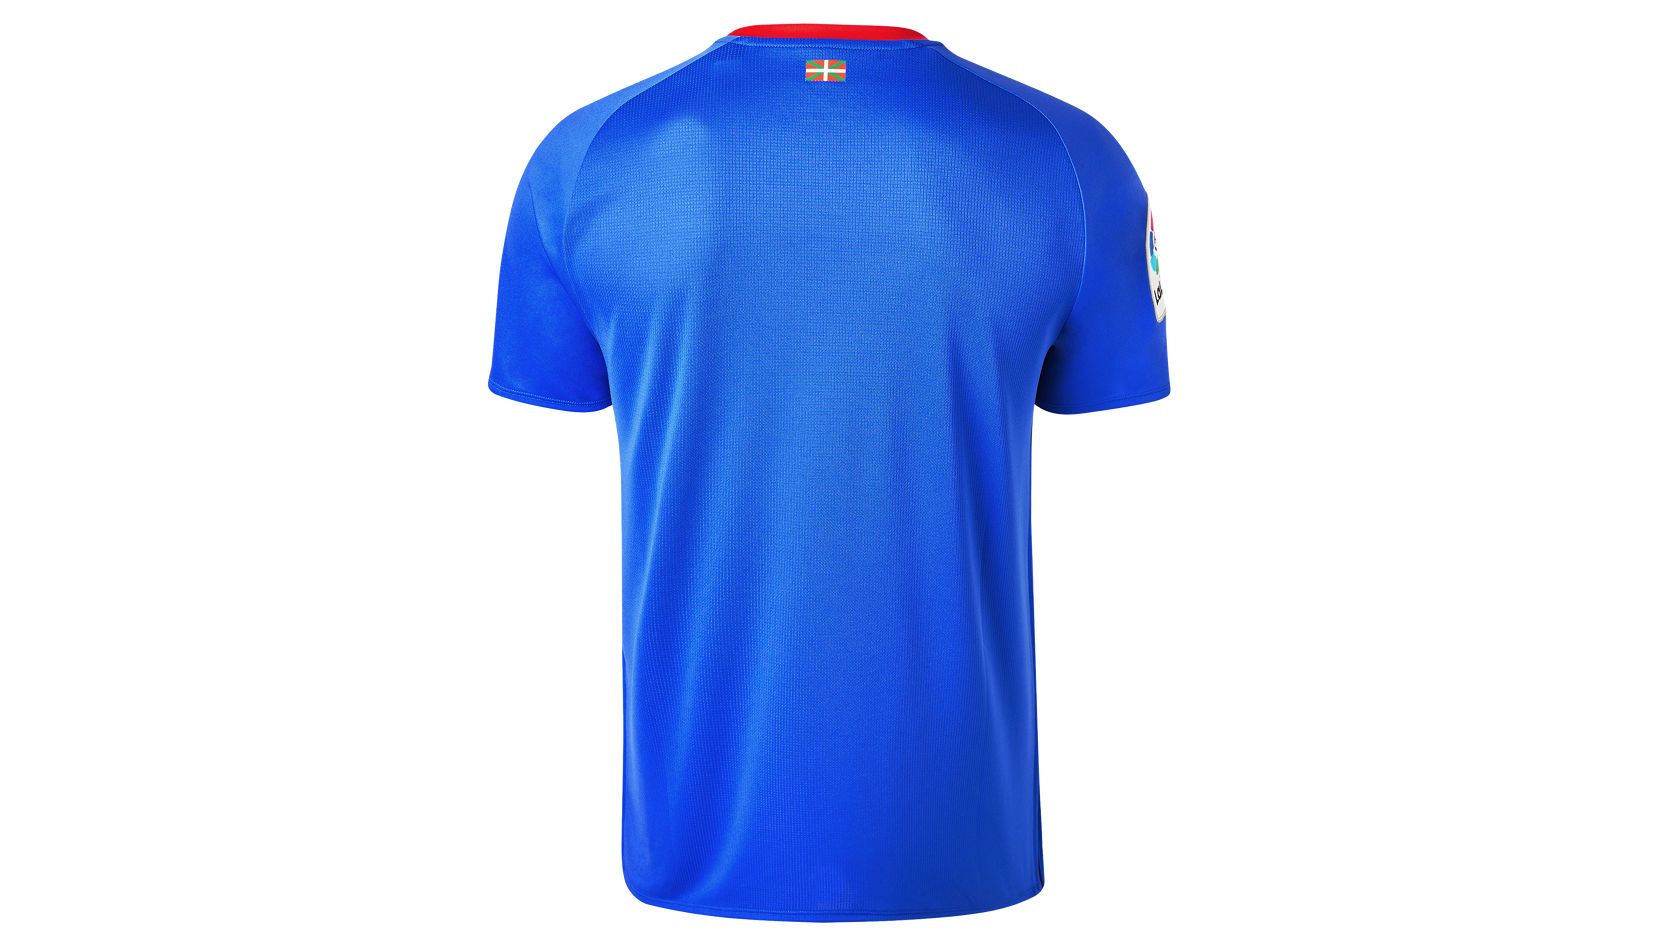 Athletic Club Mens Away Short Sleeve Jersey - Men s 830162 - Tops ... b249329b6067e